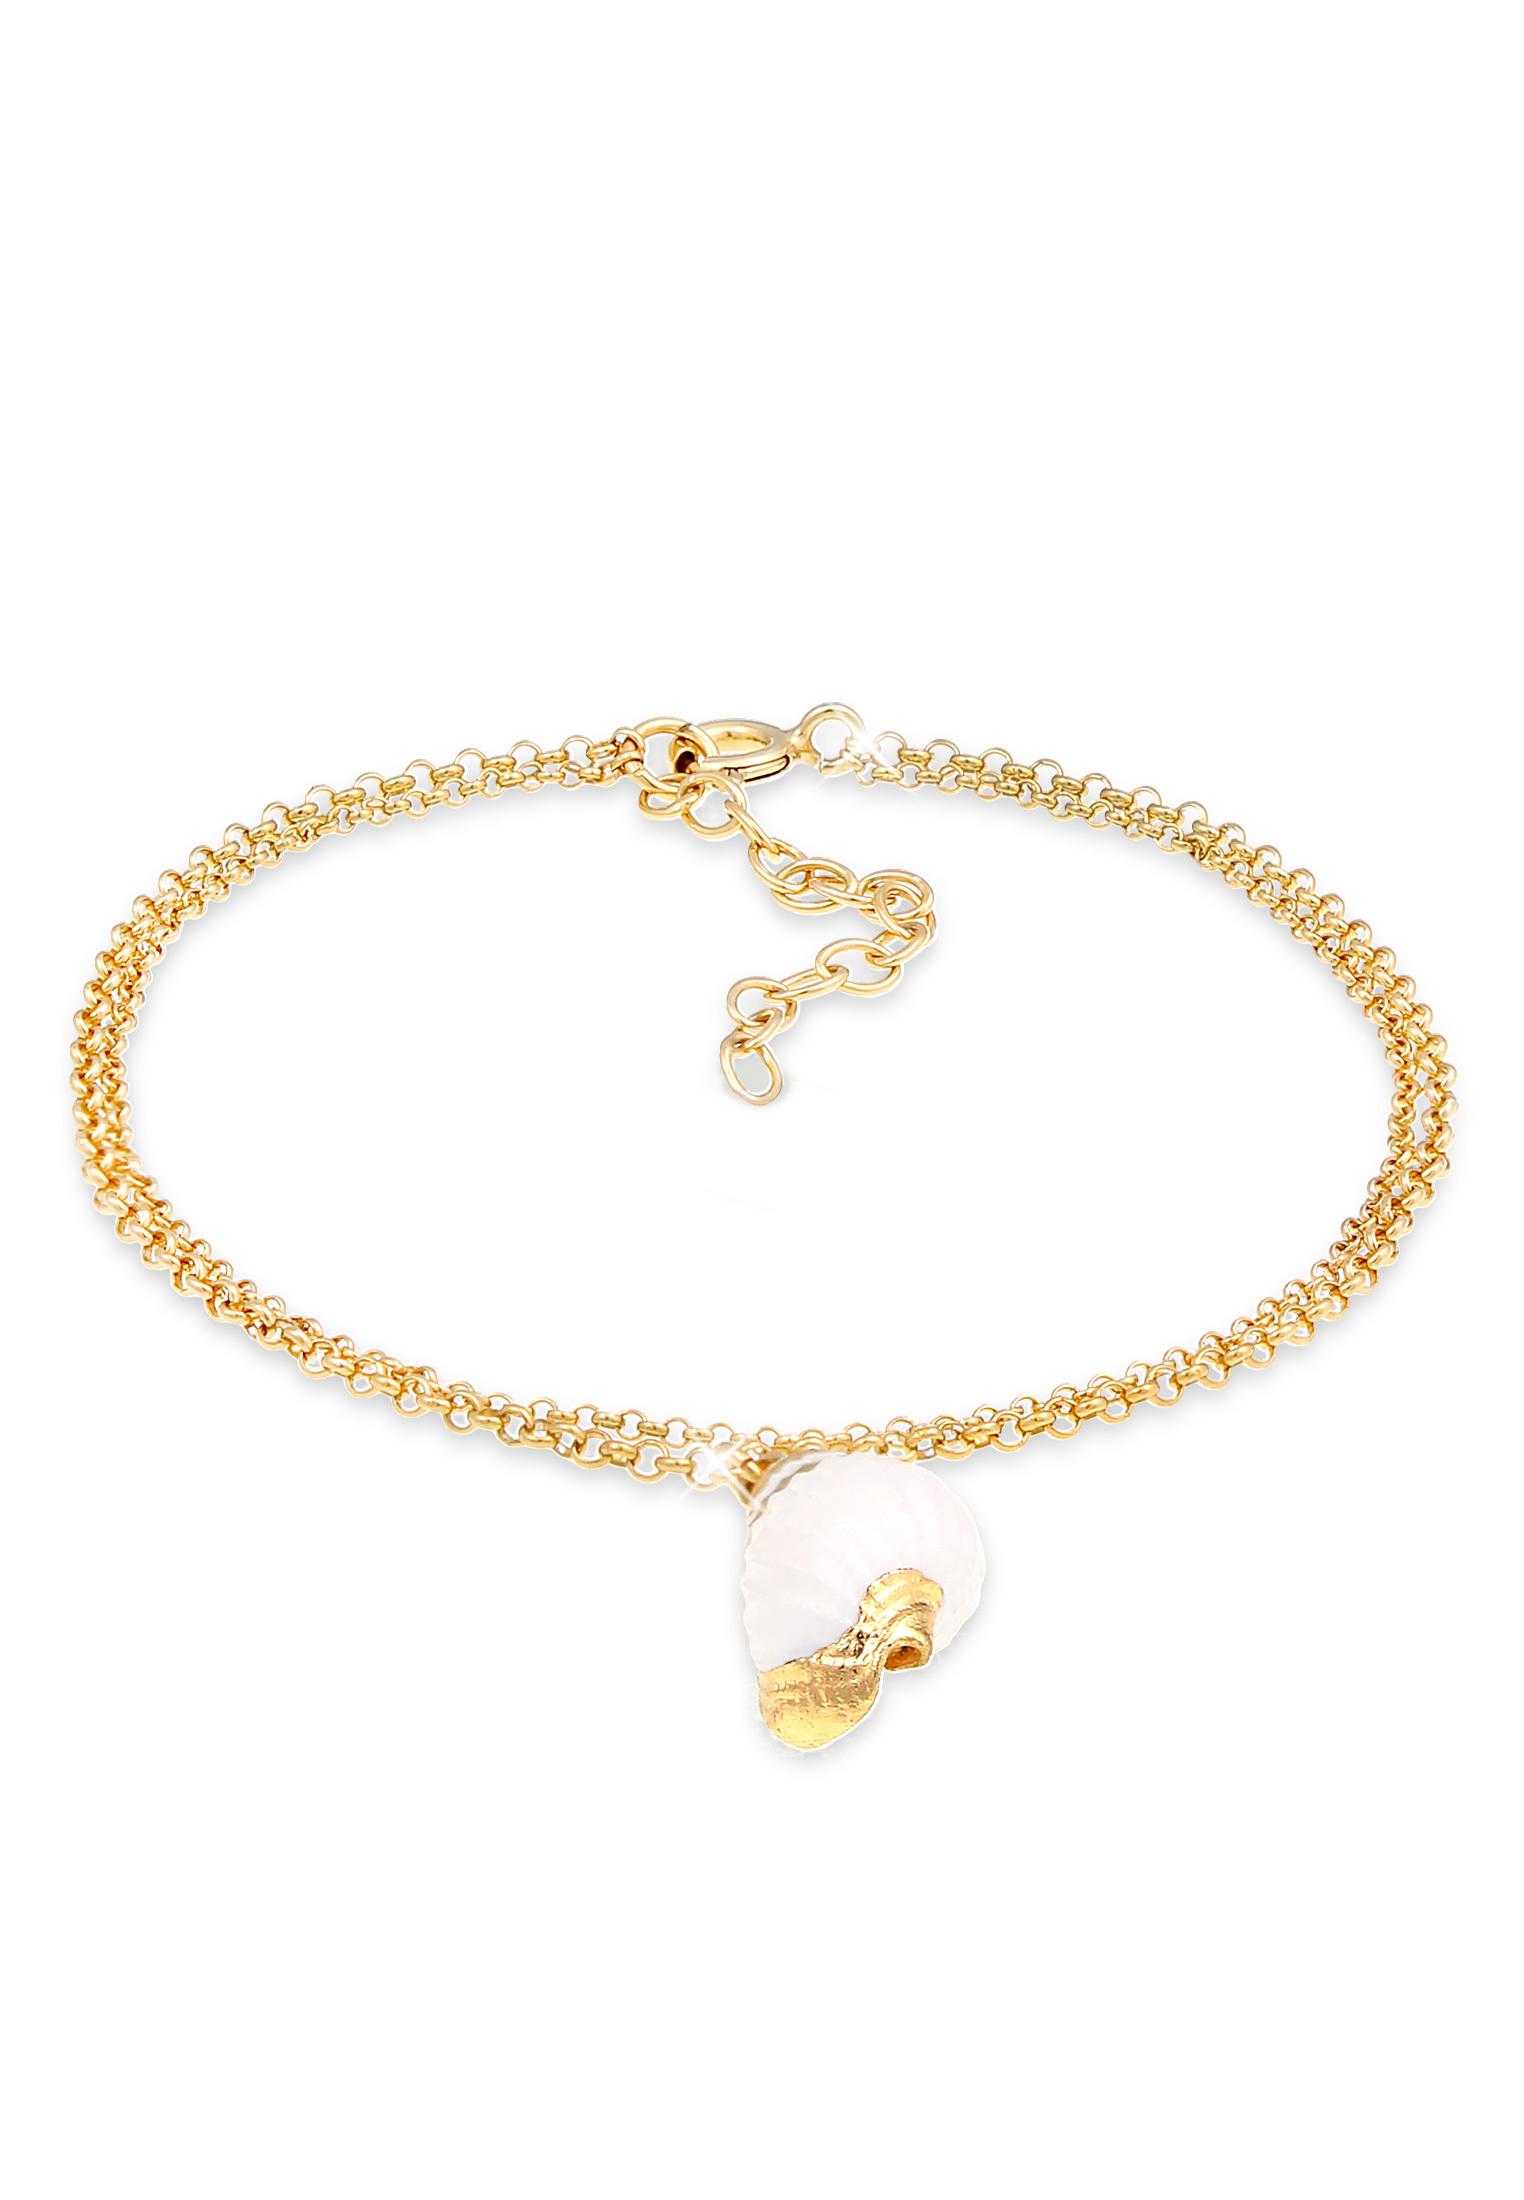 Armband Muschel | 925 Sterling Silber vergoldet